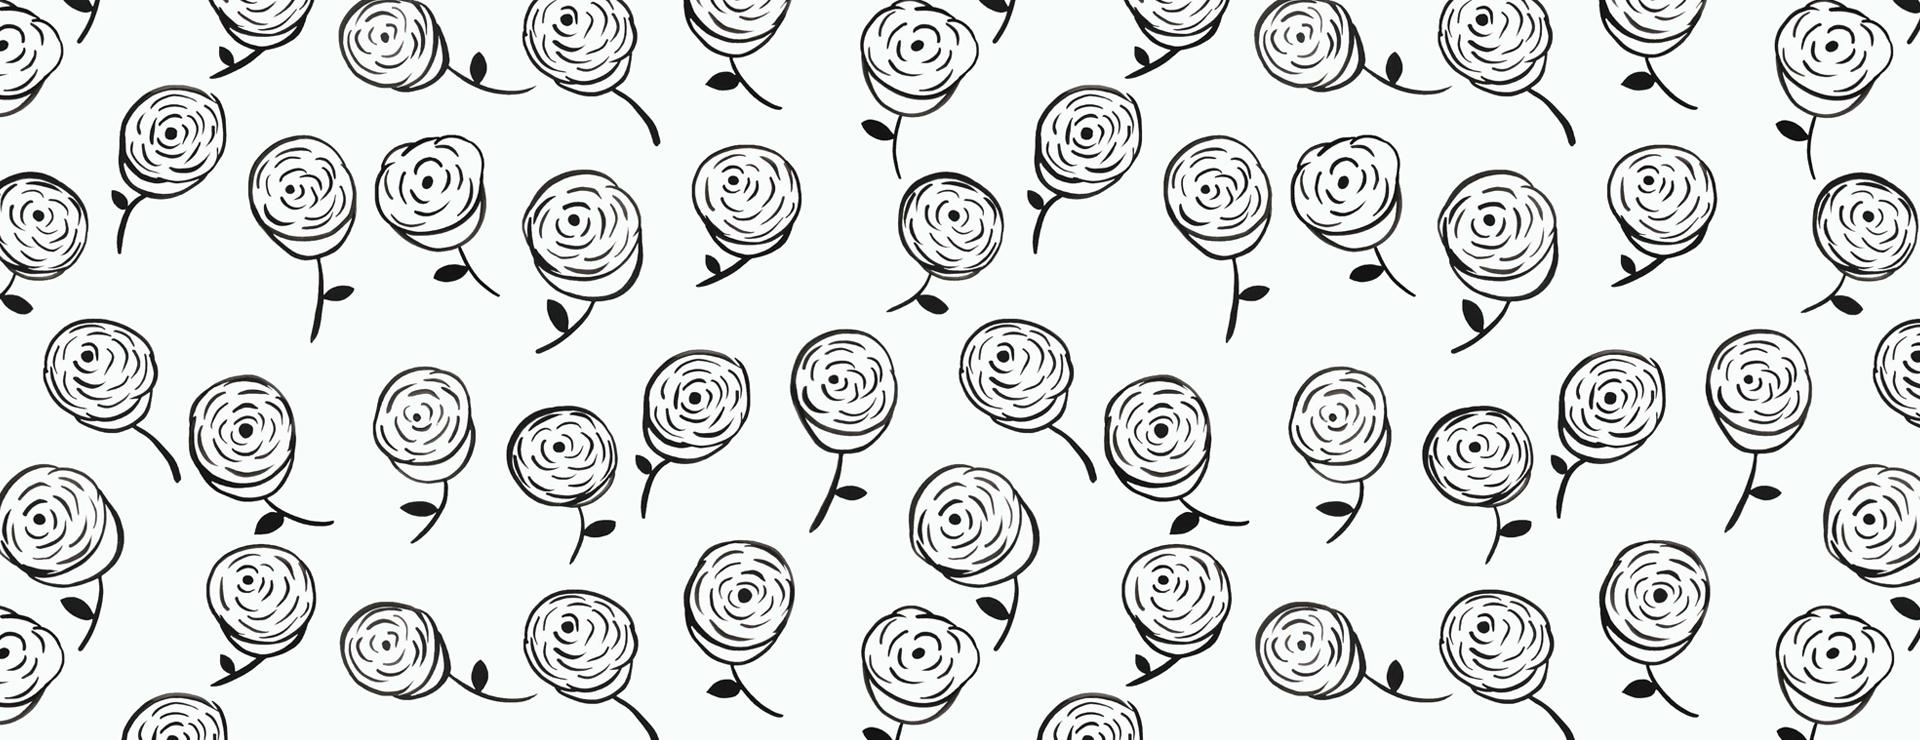 Tania J. presents new playful wallpaper. – POSTPONED